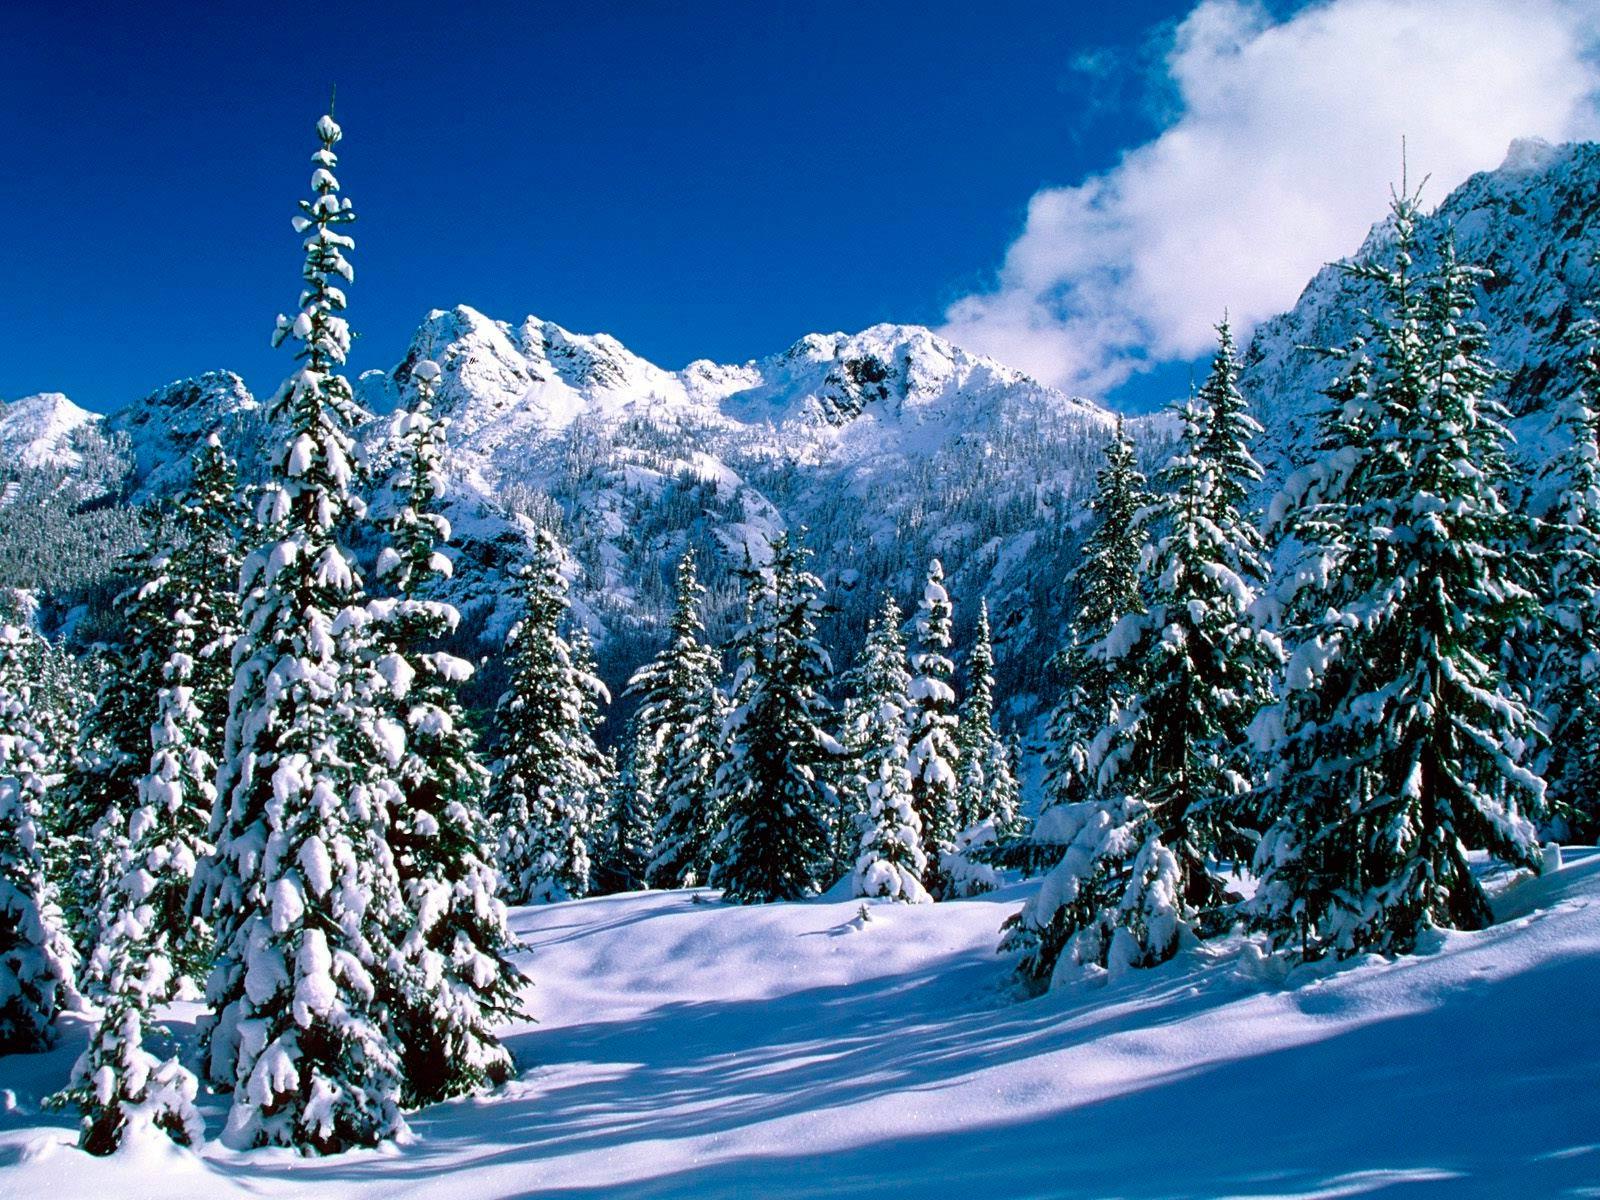 Обои зимние горы картинки фото обои